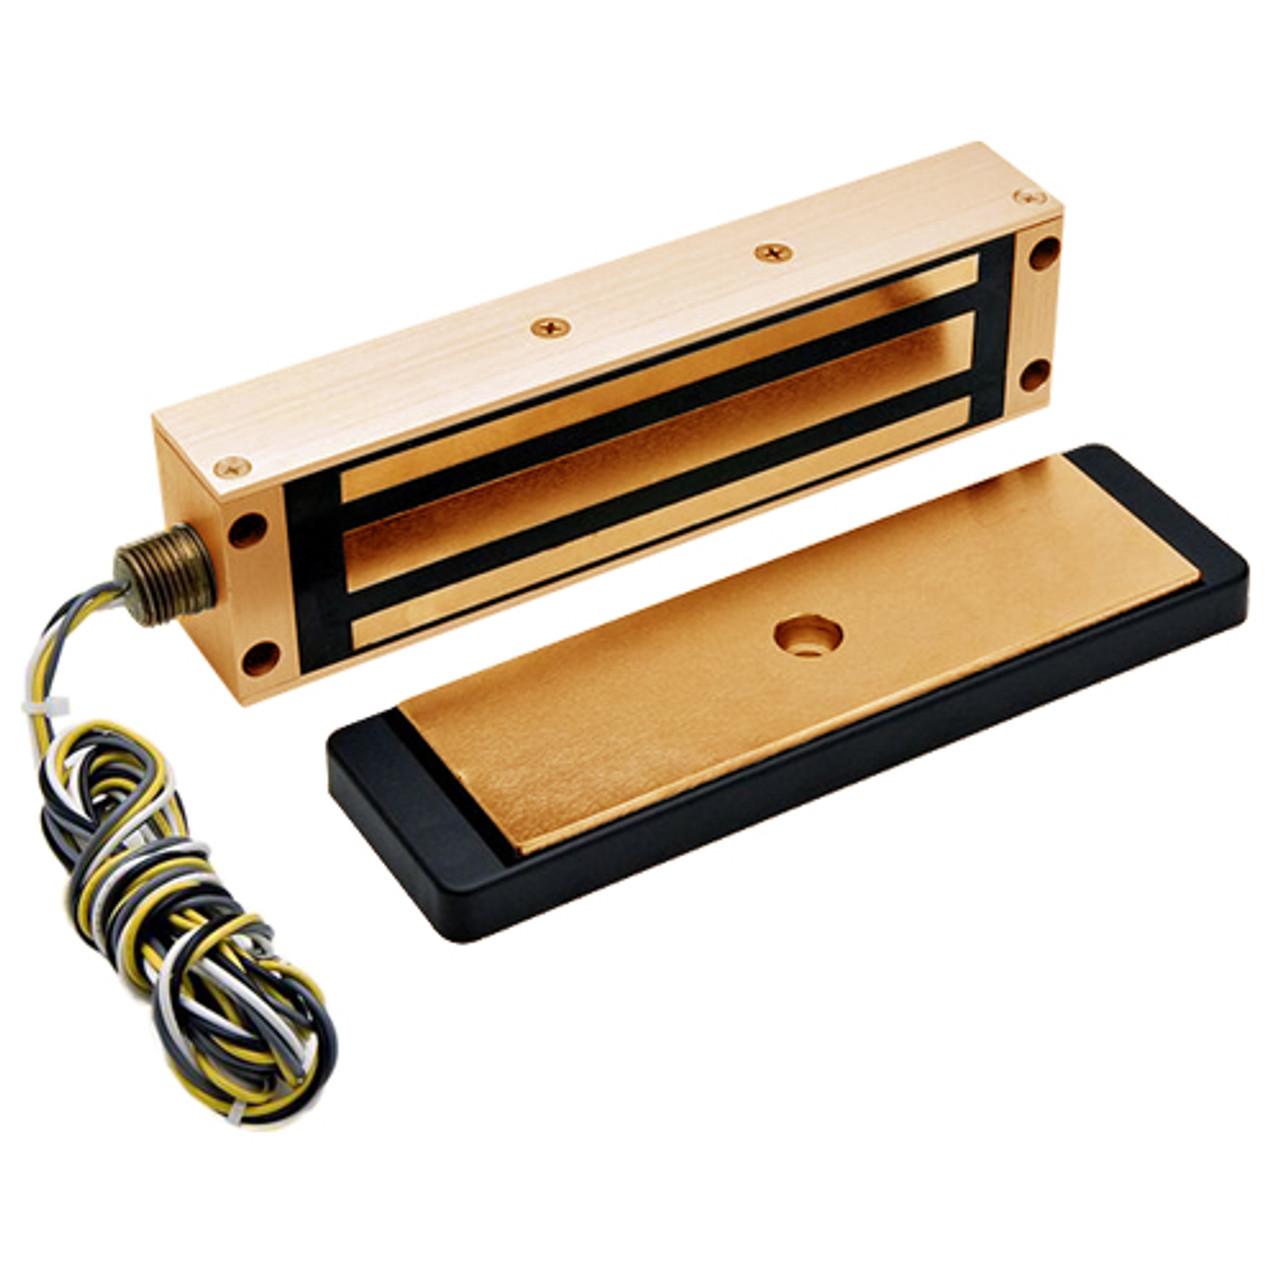 2013-US10 DynaLock 2013 Series 1200 LB Holding Force Single Electromagnetic Gate Lock in Satin Bronze